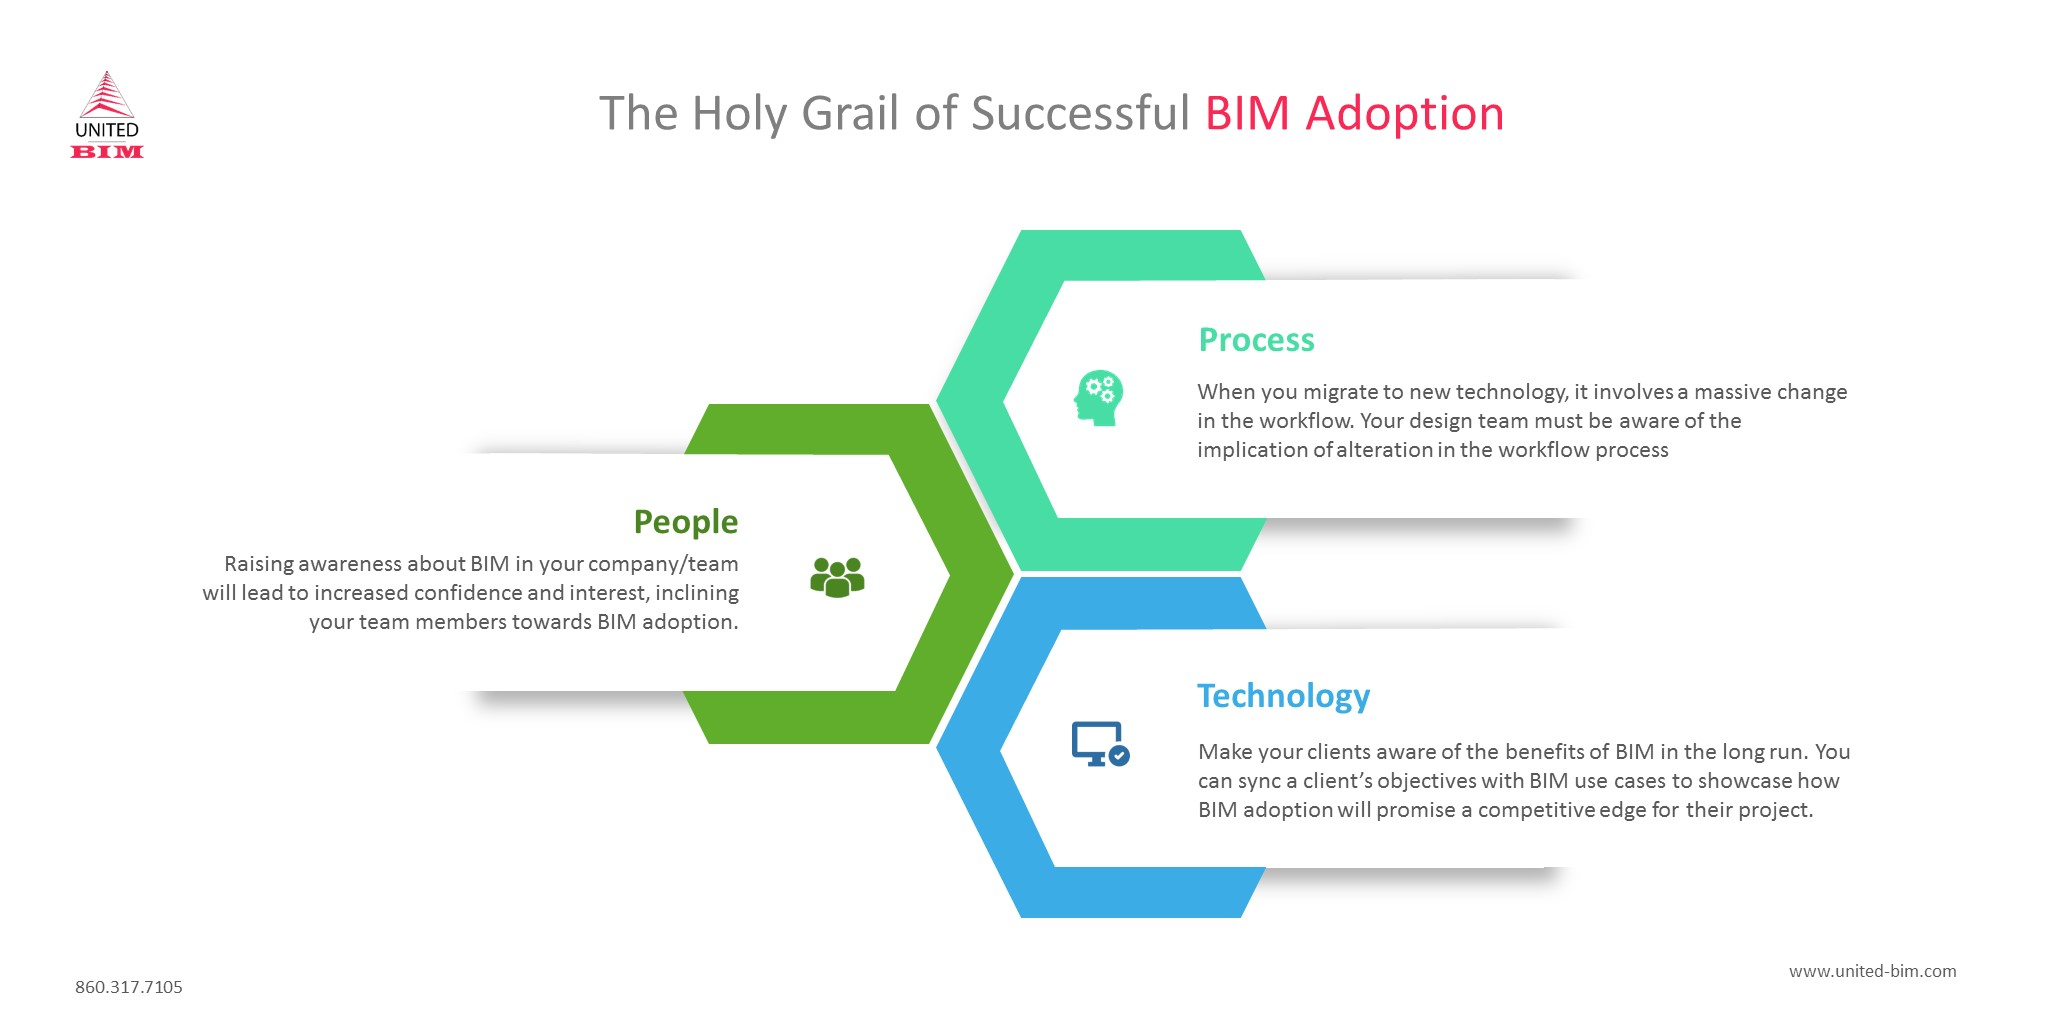 The Holy Grail of Successful BIM Adoption by United-BIM